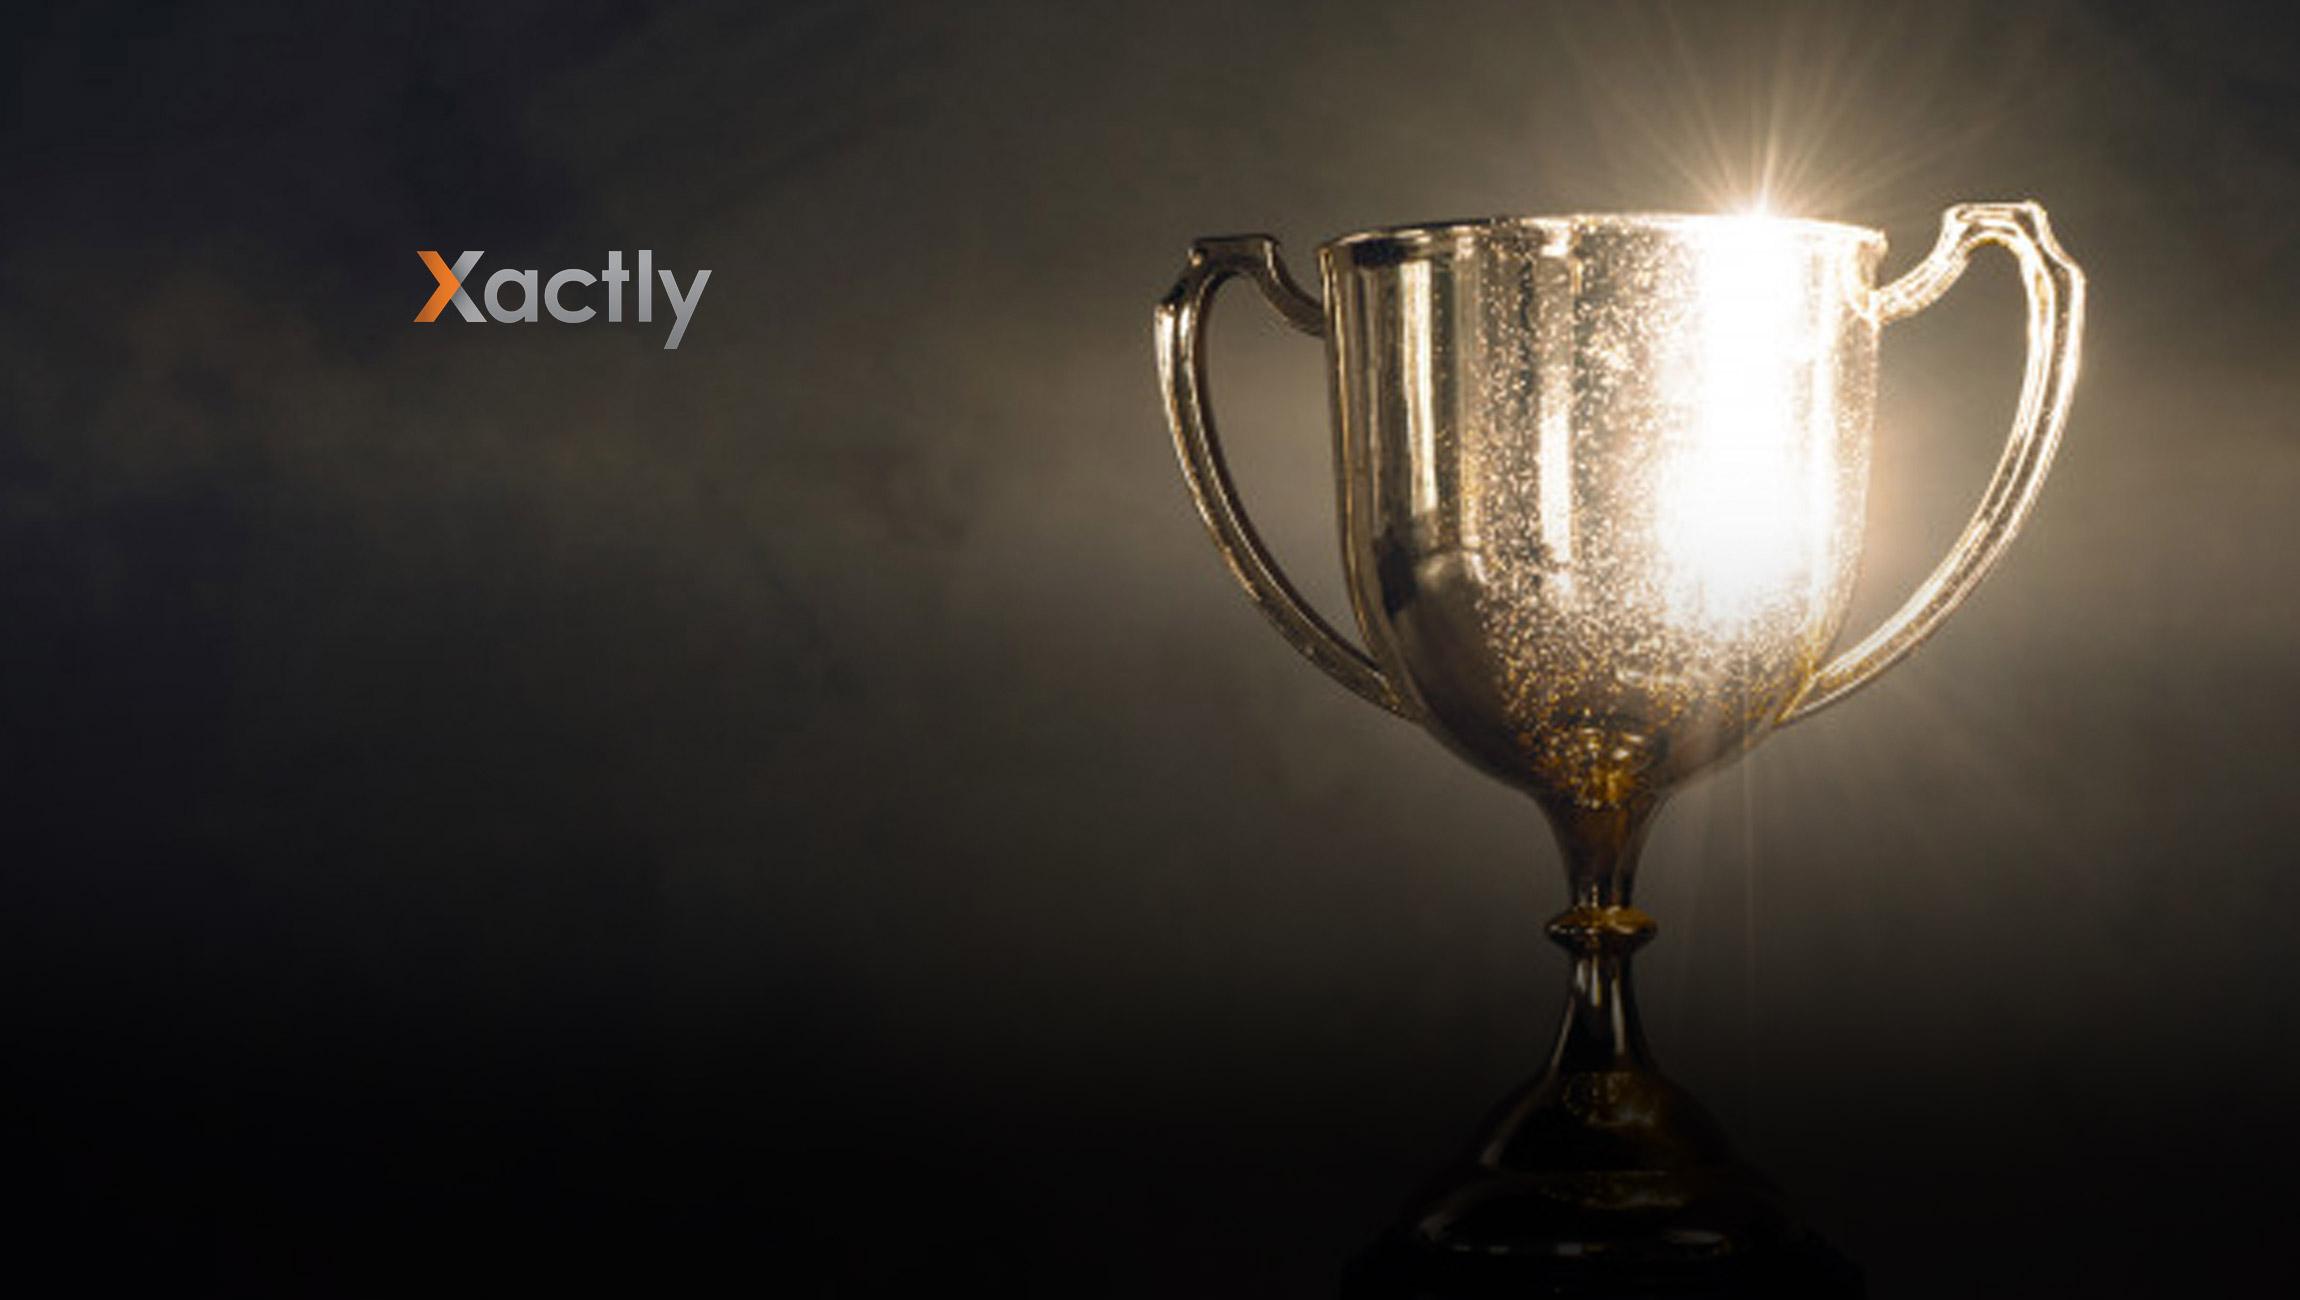 Xactly-Forecasting-Wins-2021-BIG-Innovation-Award